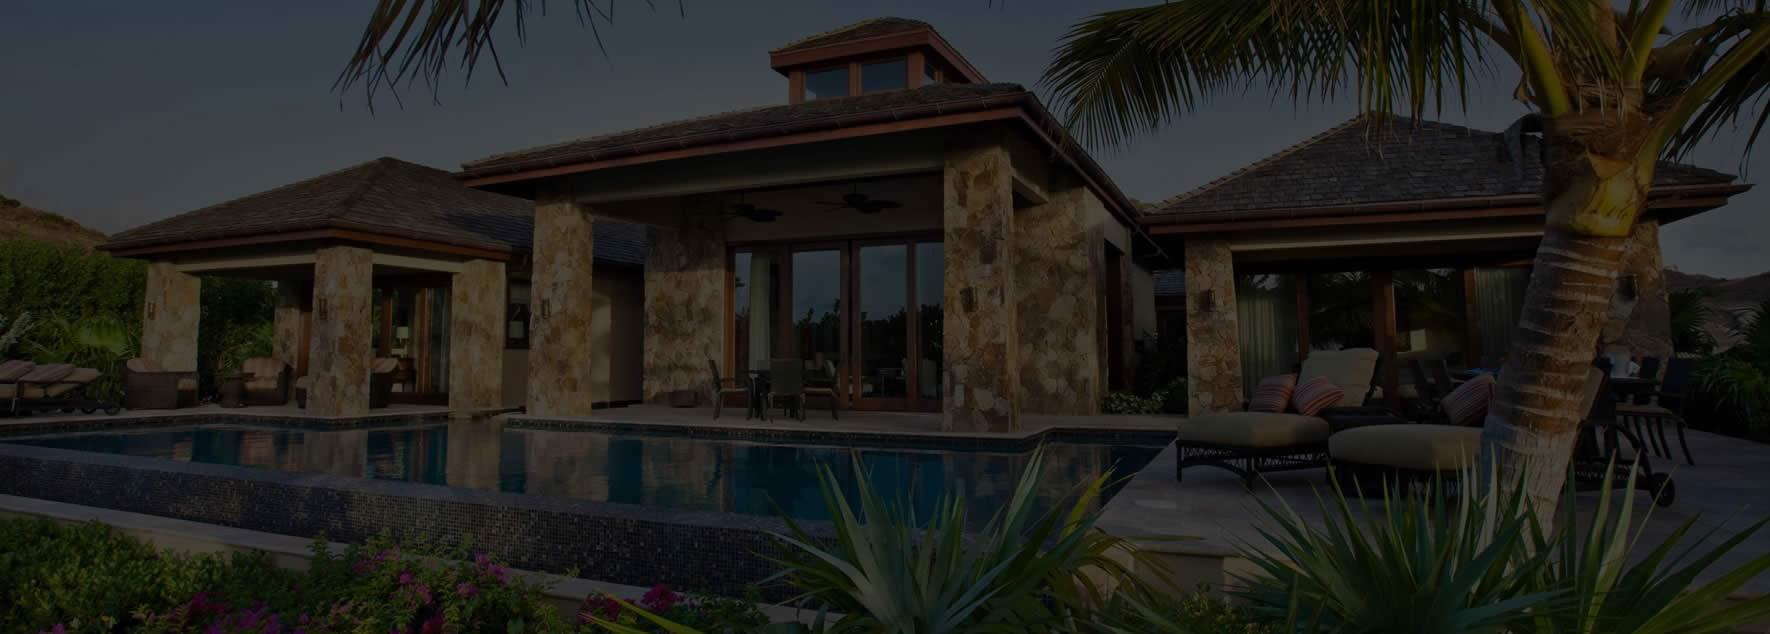 Villa de luxe à vendre à Miami